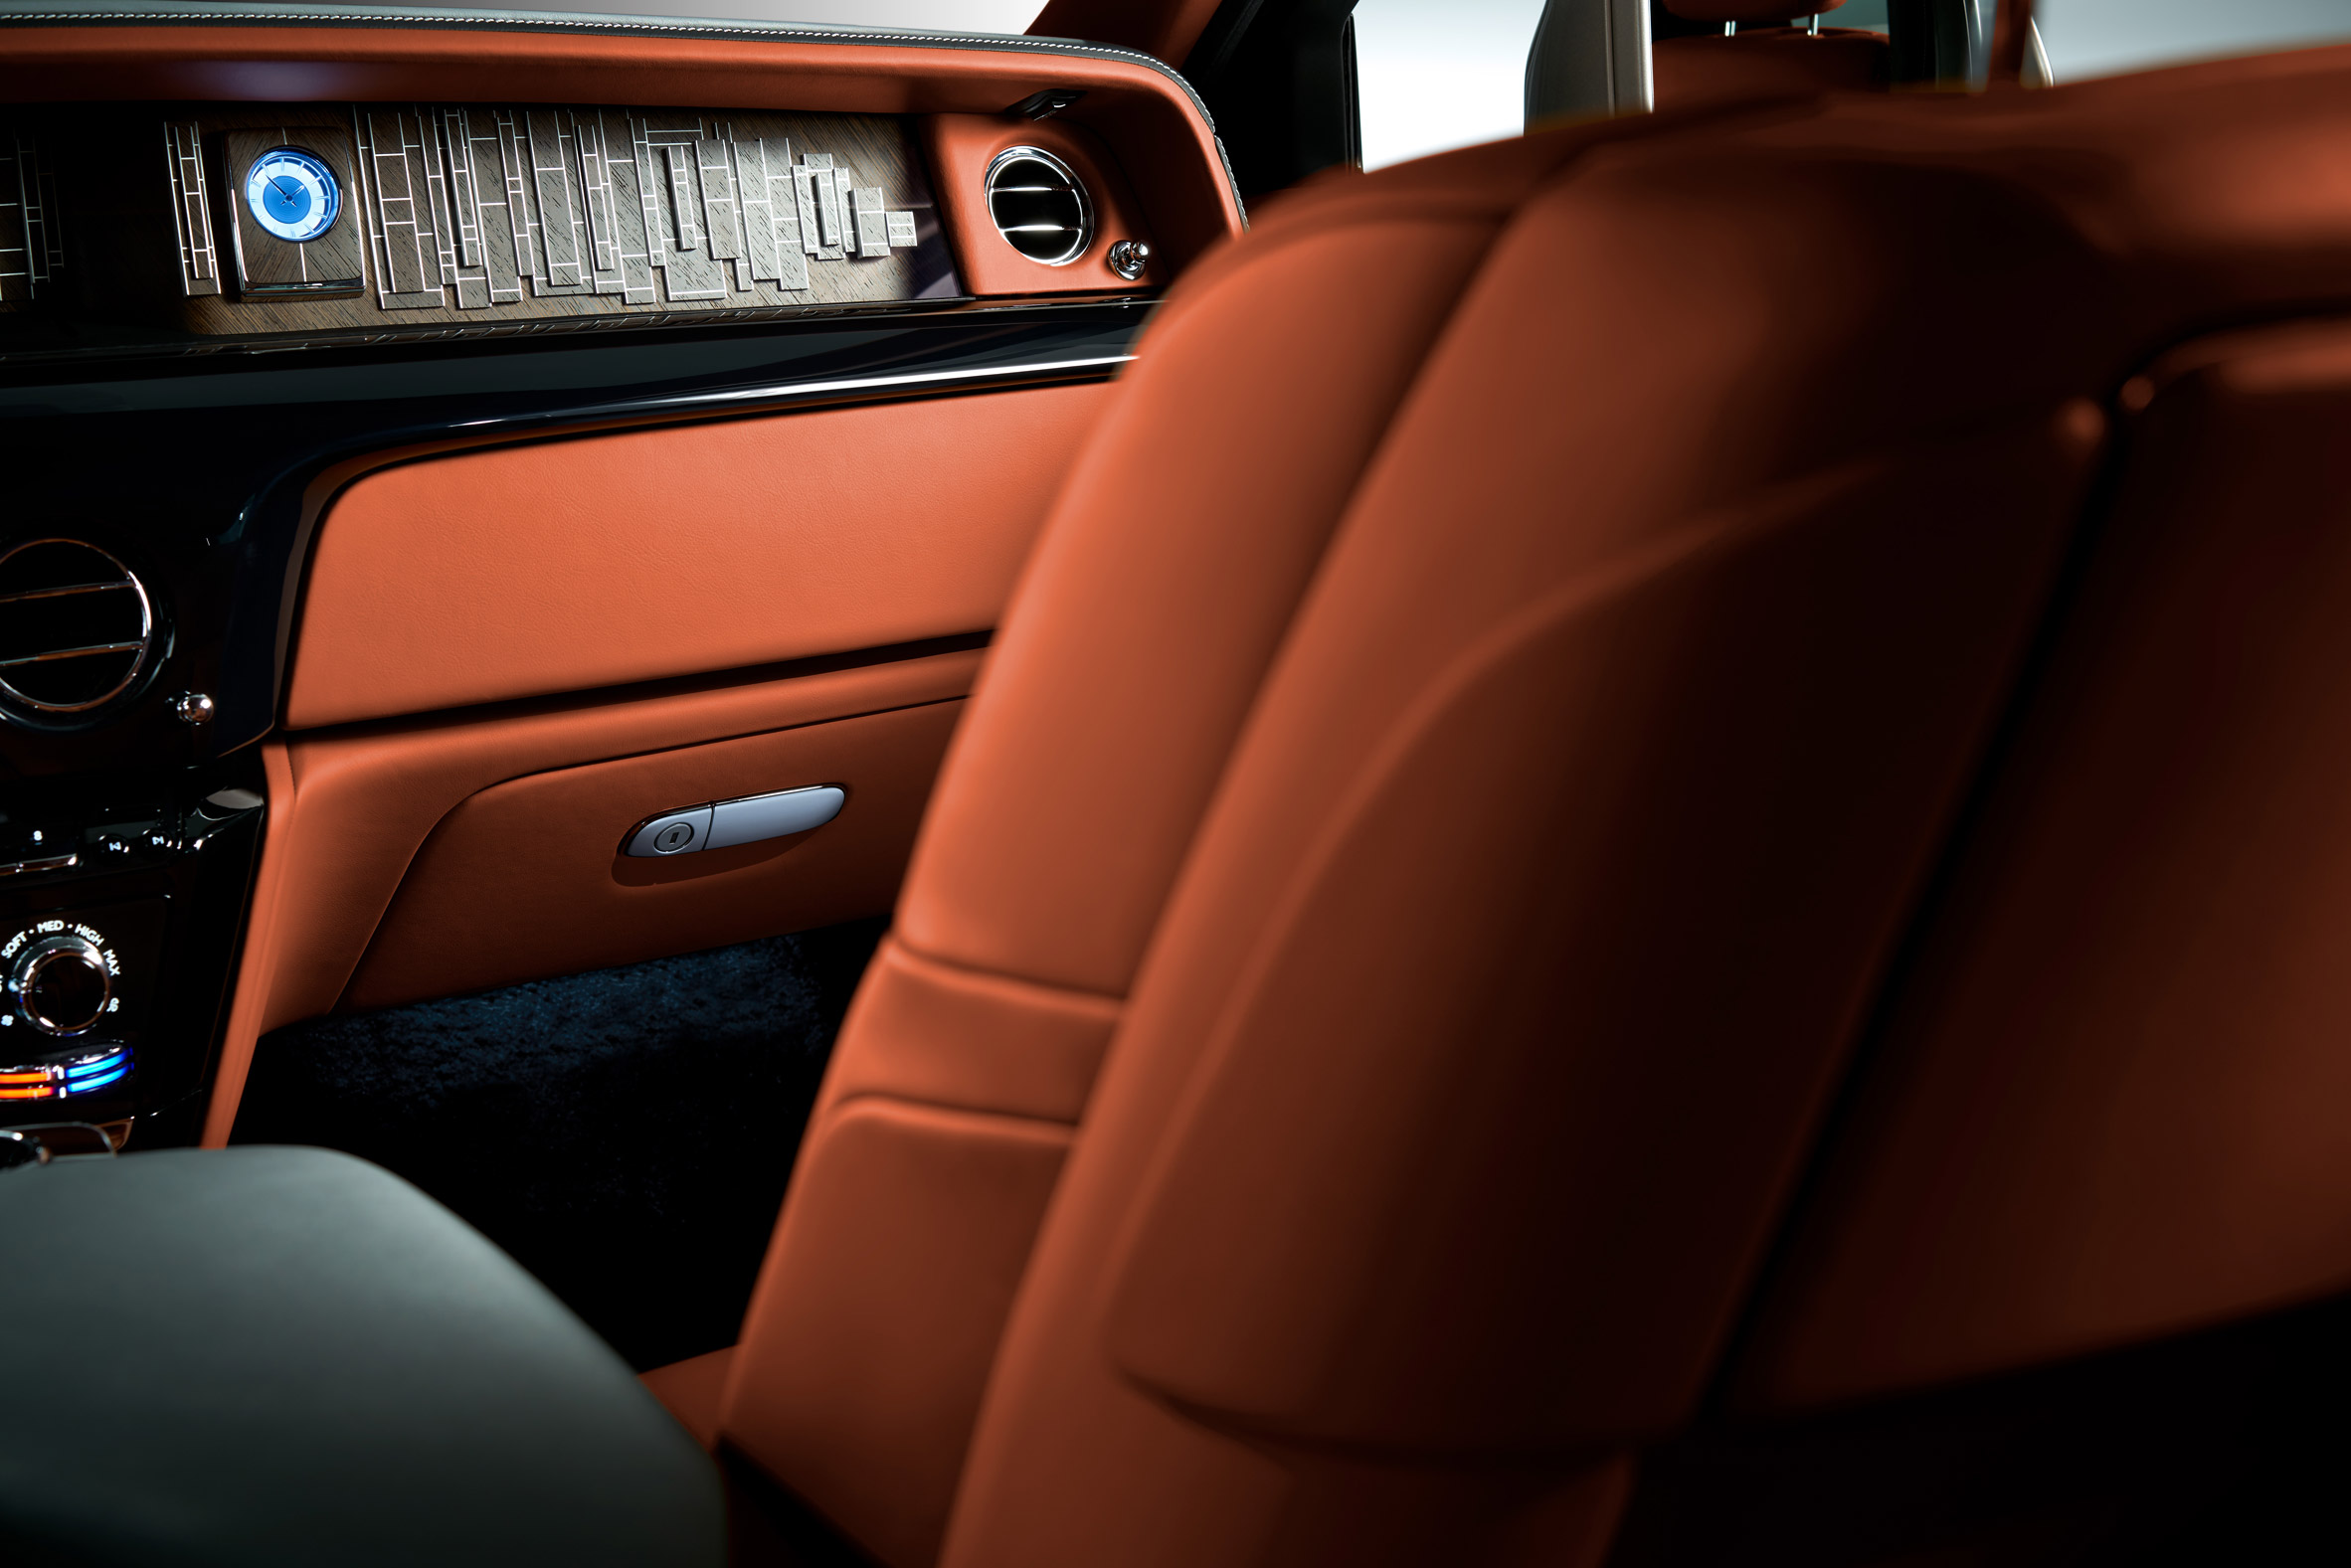 Latest Rolls-Royce Phantom incorporates an art gallery in its dashboard